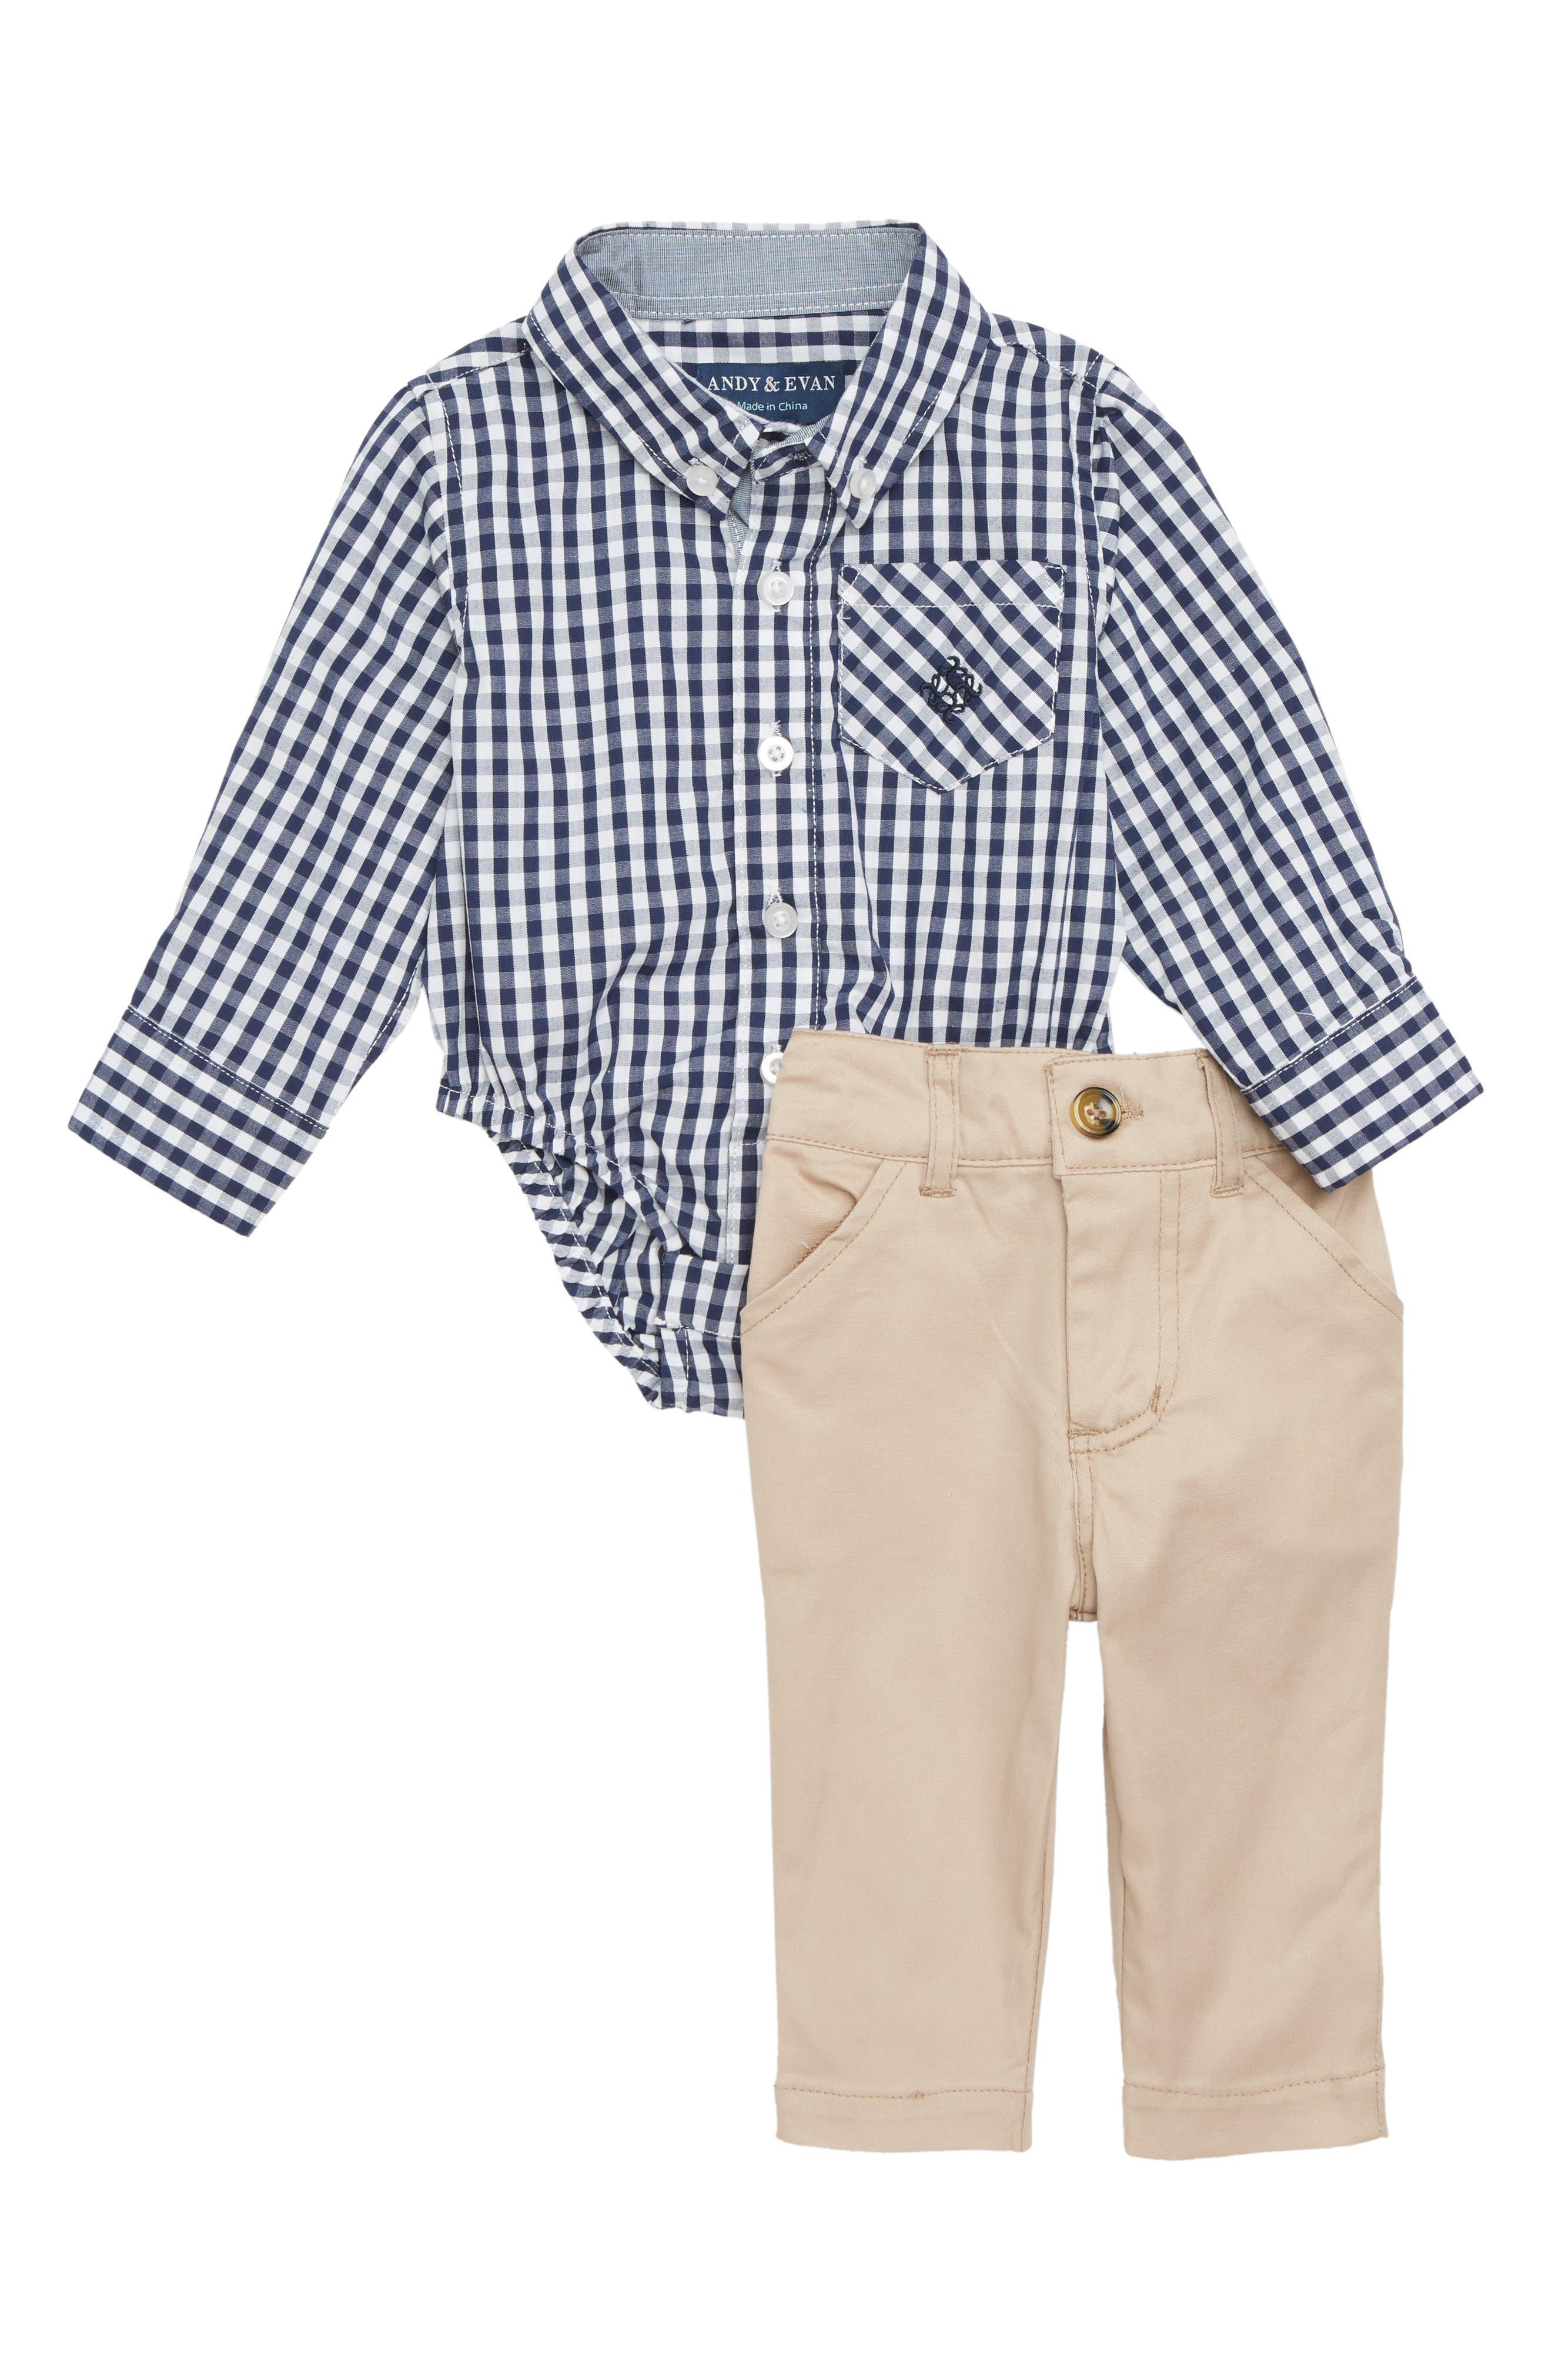 Andy & Evan Shirtzie Gingham Check Bodysuit & Pants Set (Baby Boys)